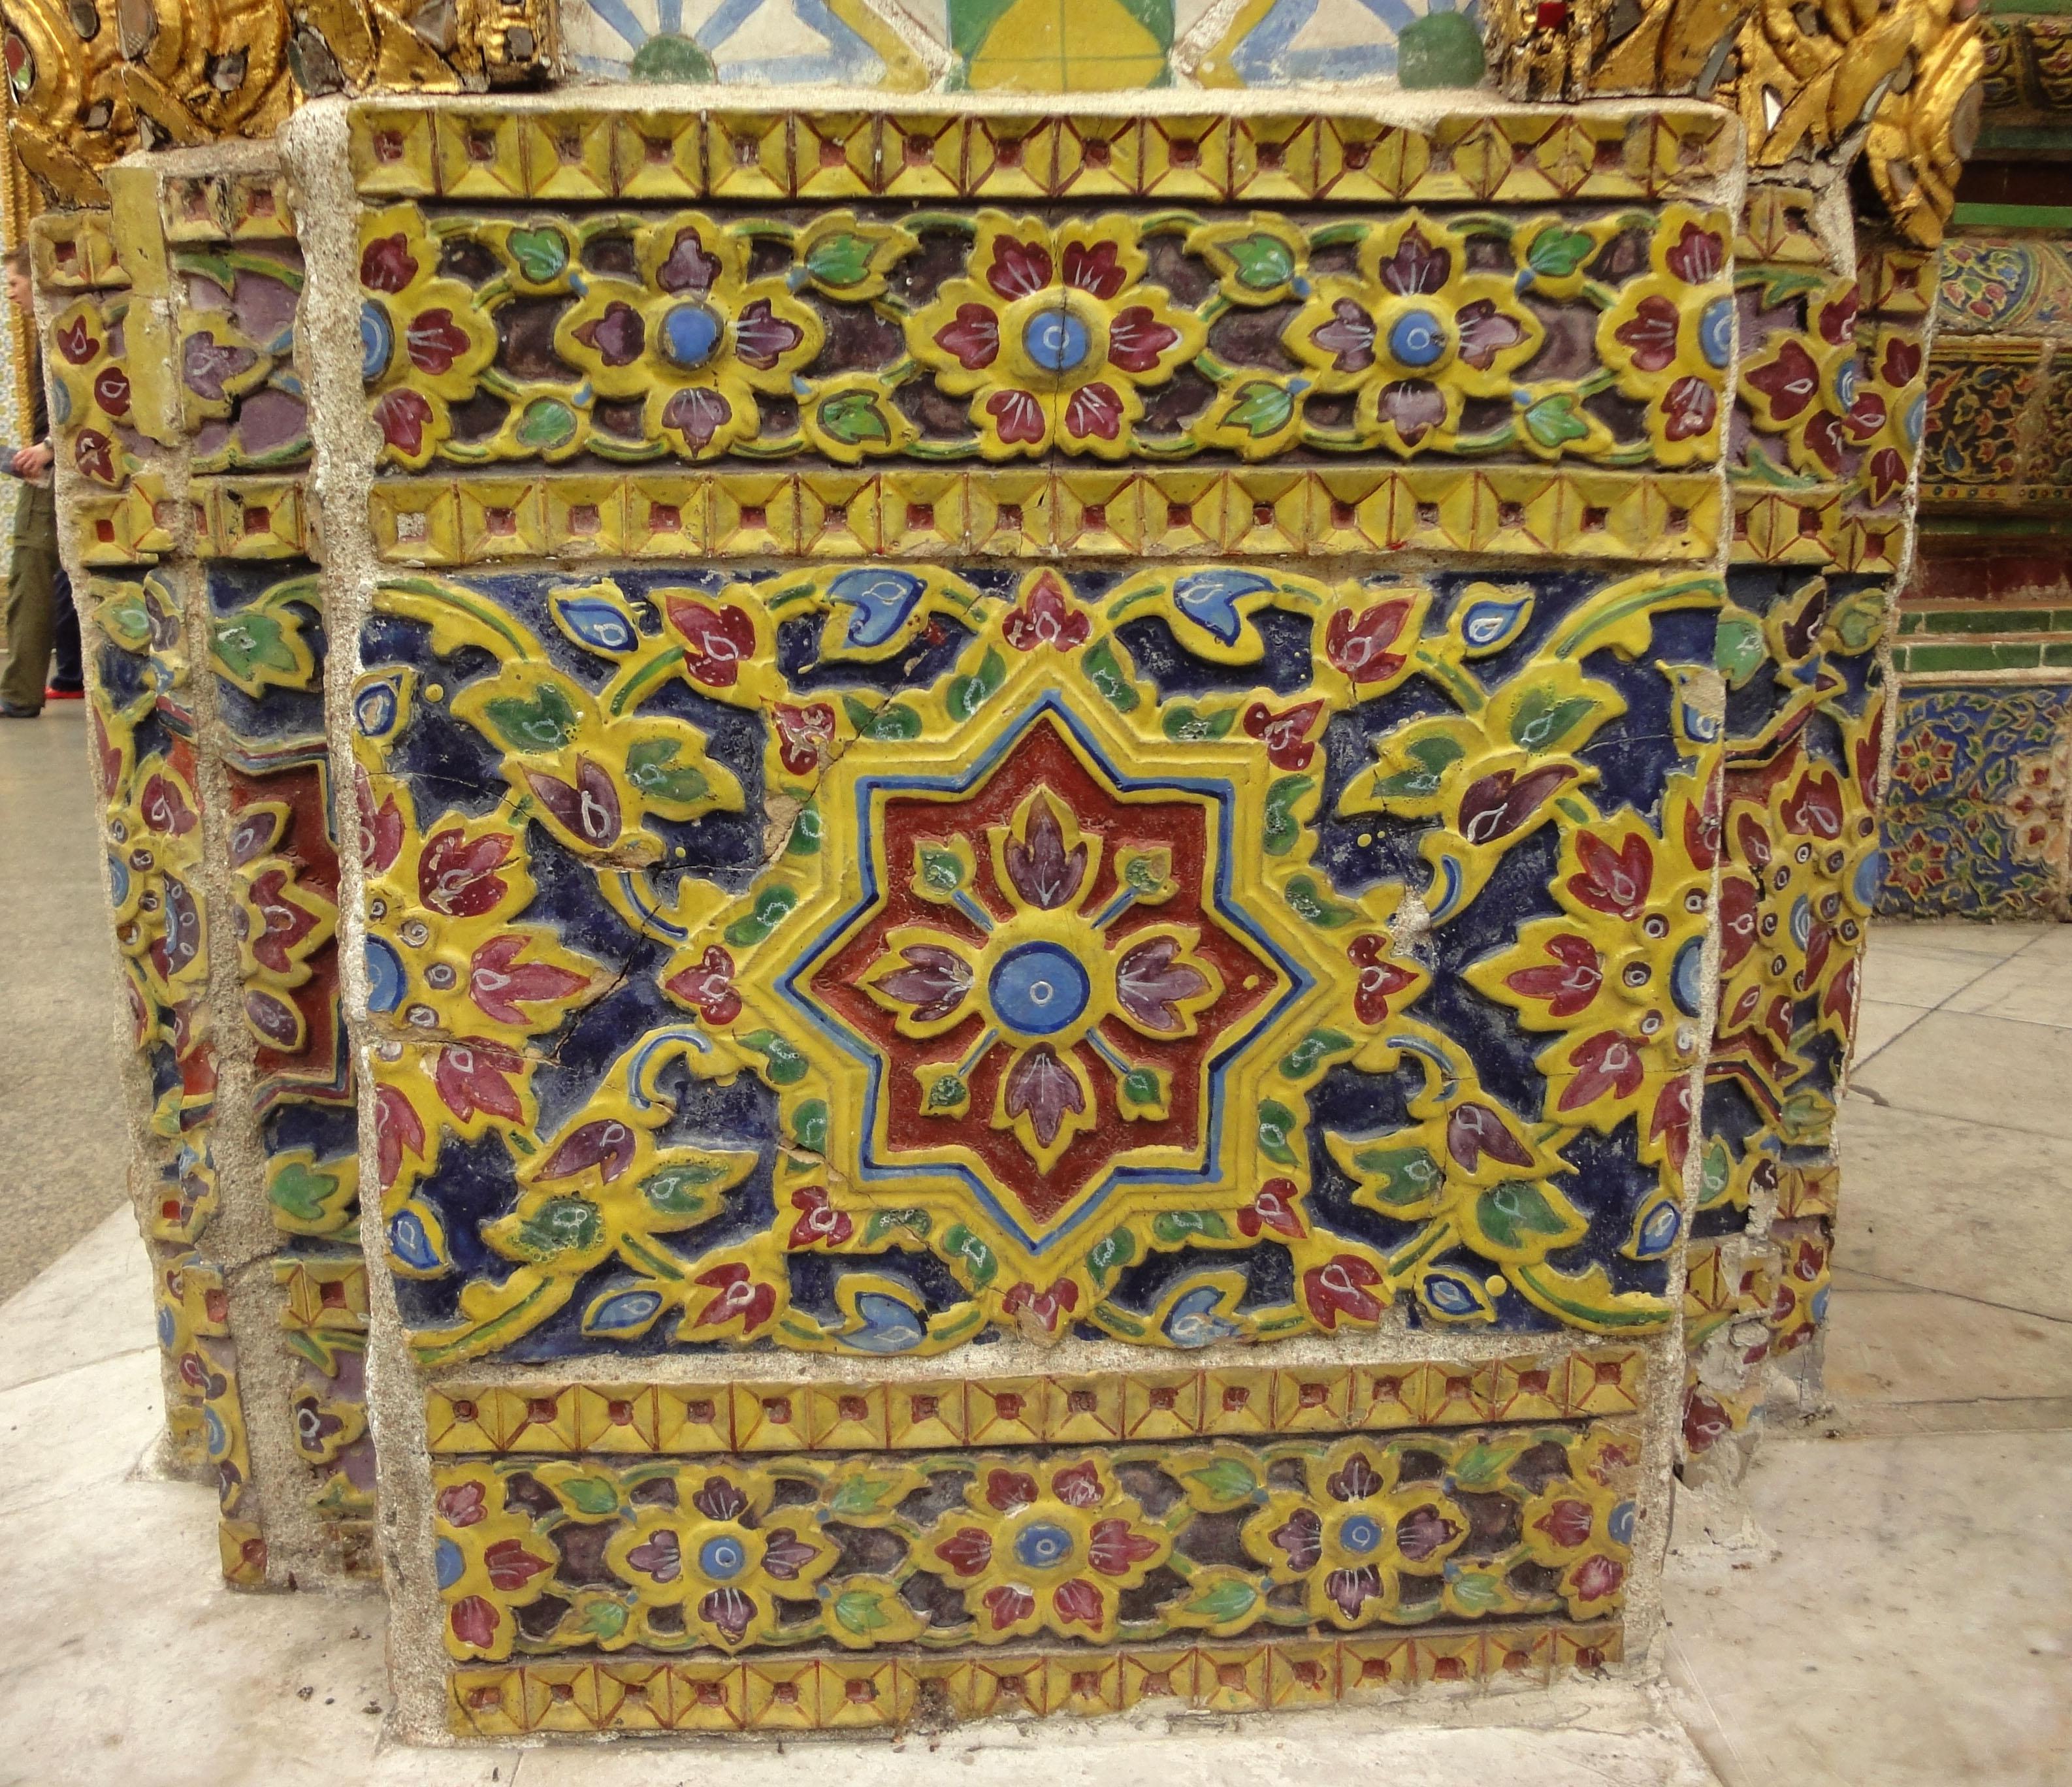 Grand Palace beautifully designed Chinese Mosaic tiles Bangkok Thailand 04